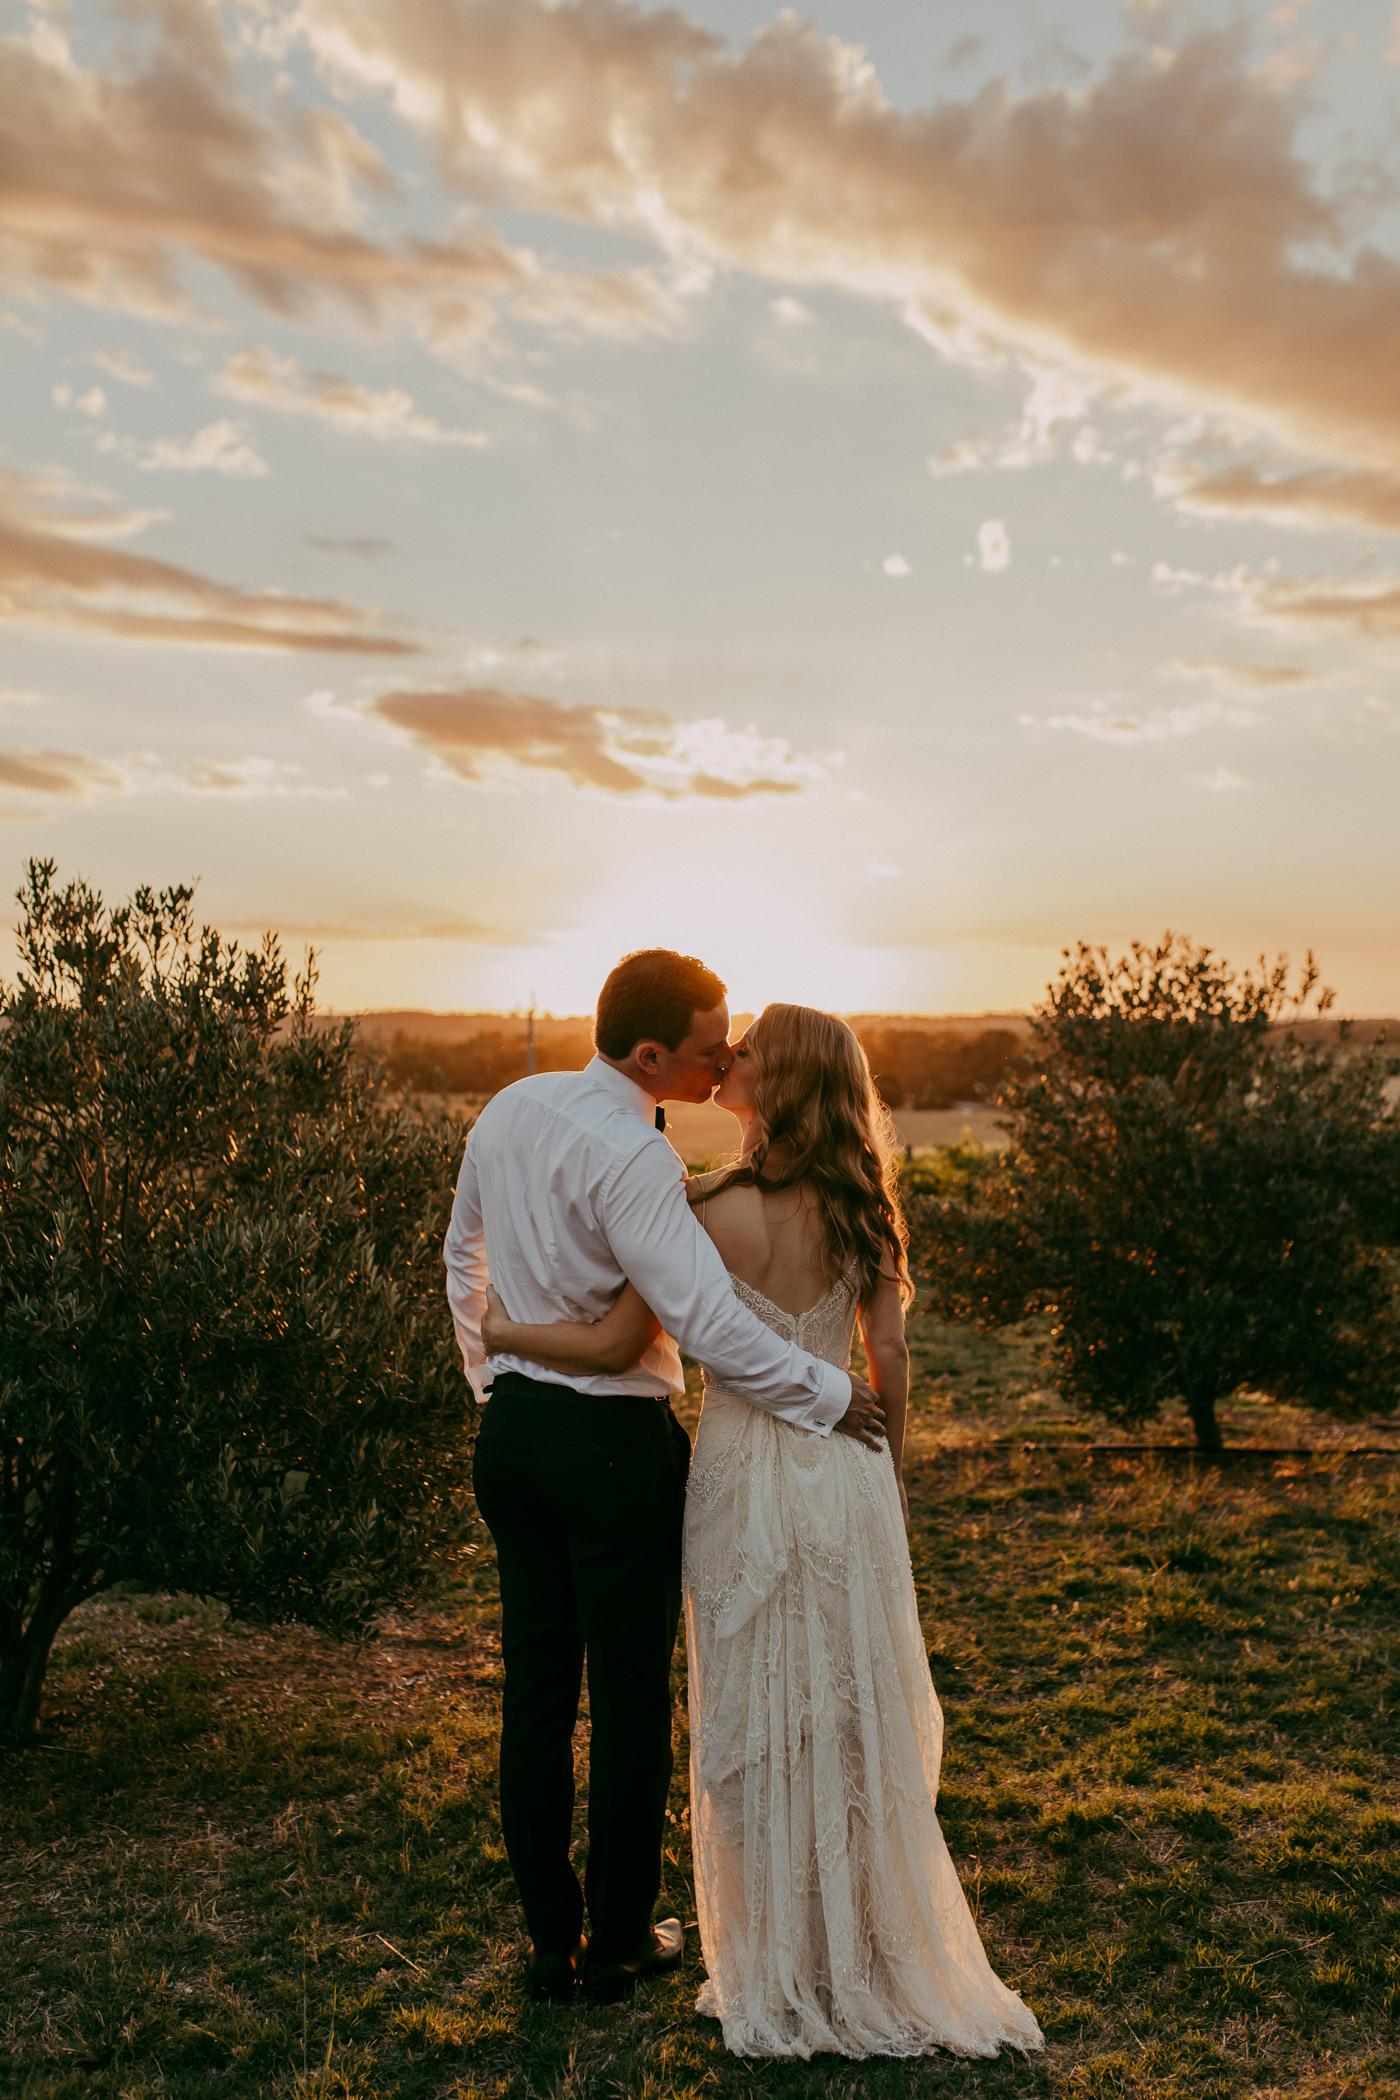 Anthony & Eliet - Wagga Wagga Wedding - Country NSW - Samantha Heather Photography-154.jpg